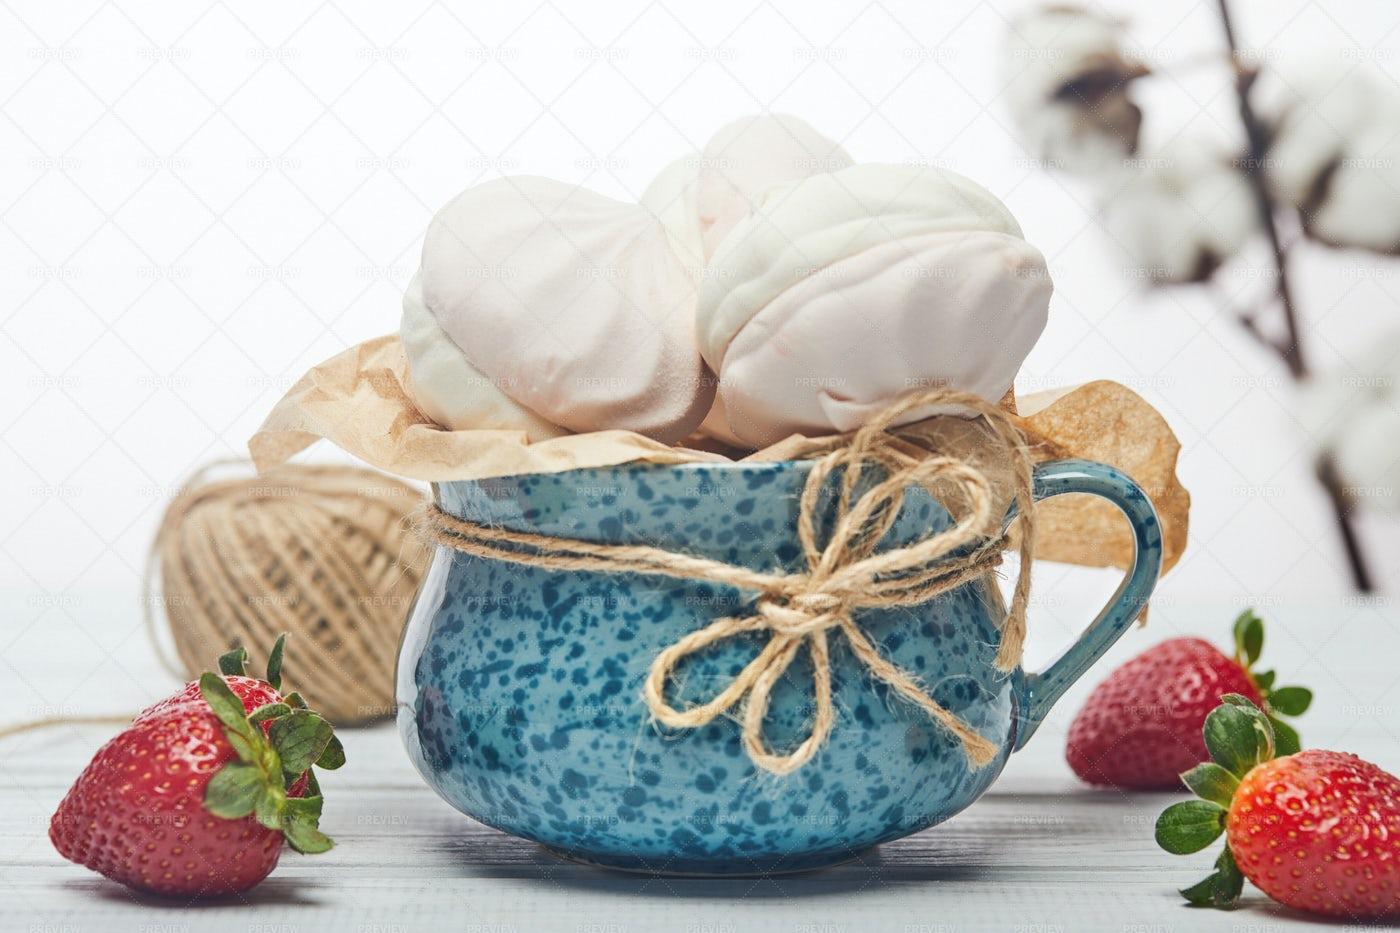 Marshmallows In Cup: Stock Photos